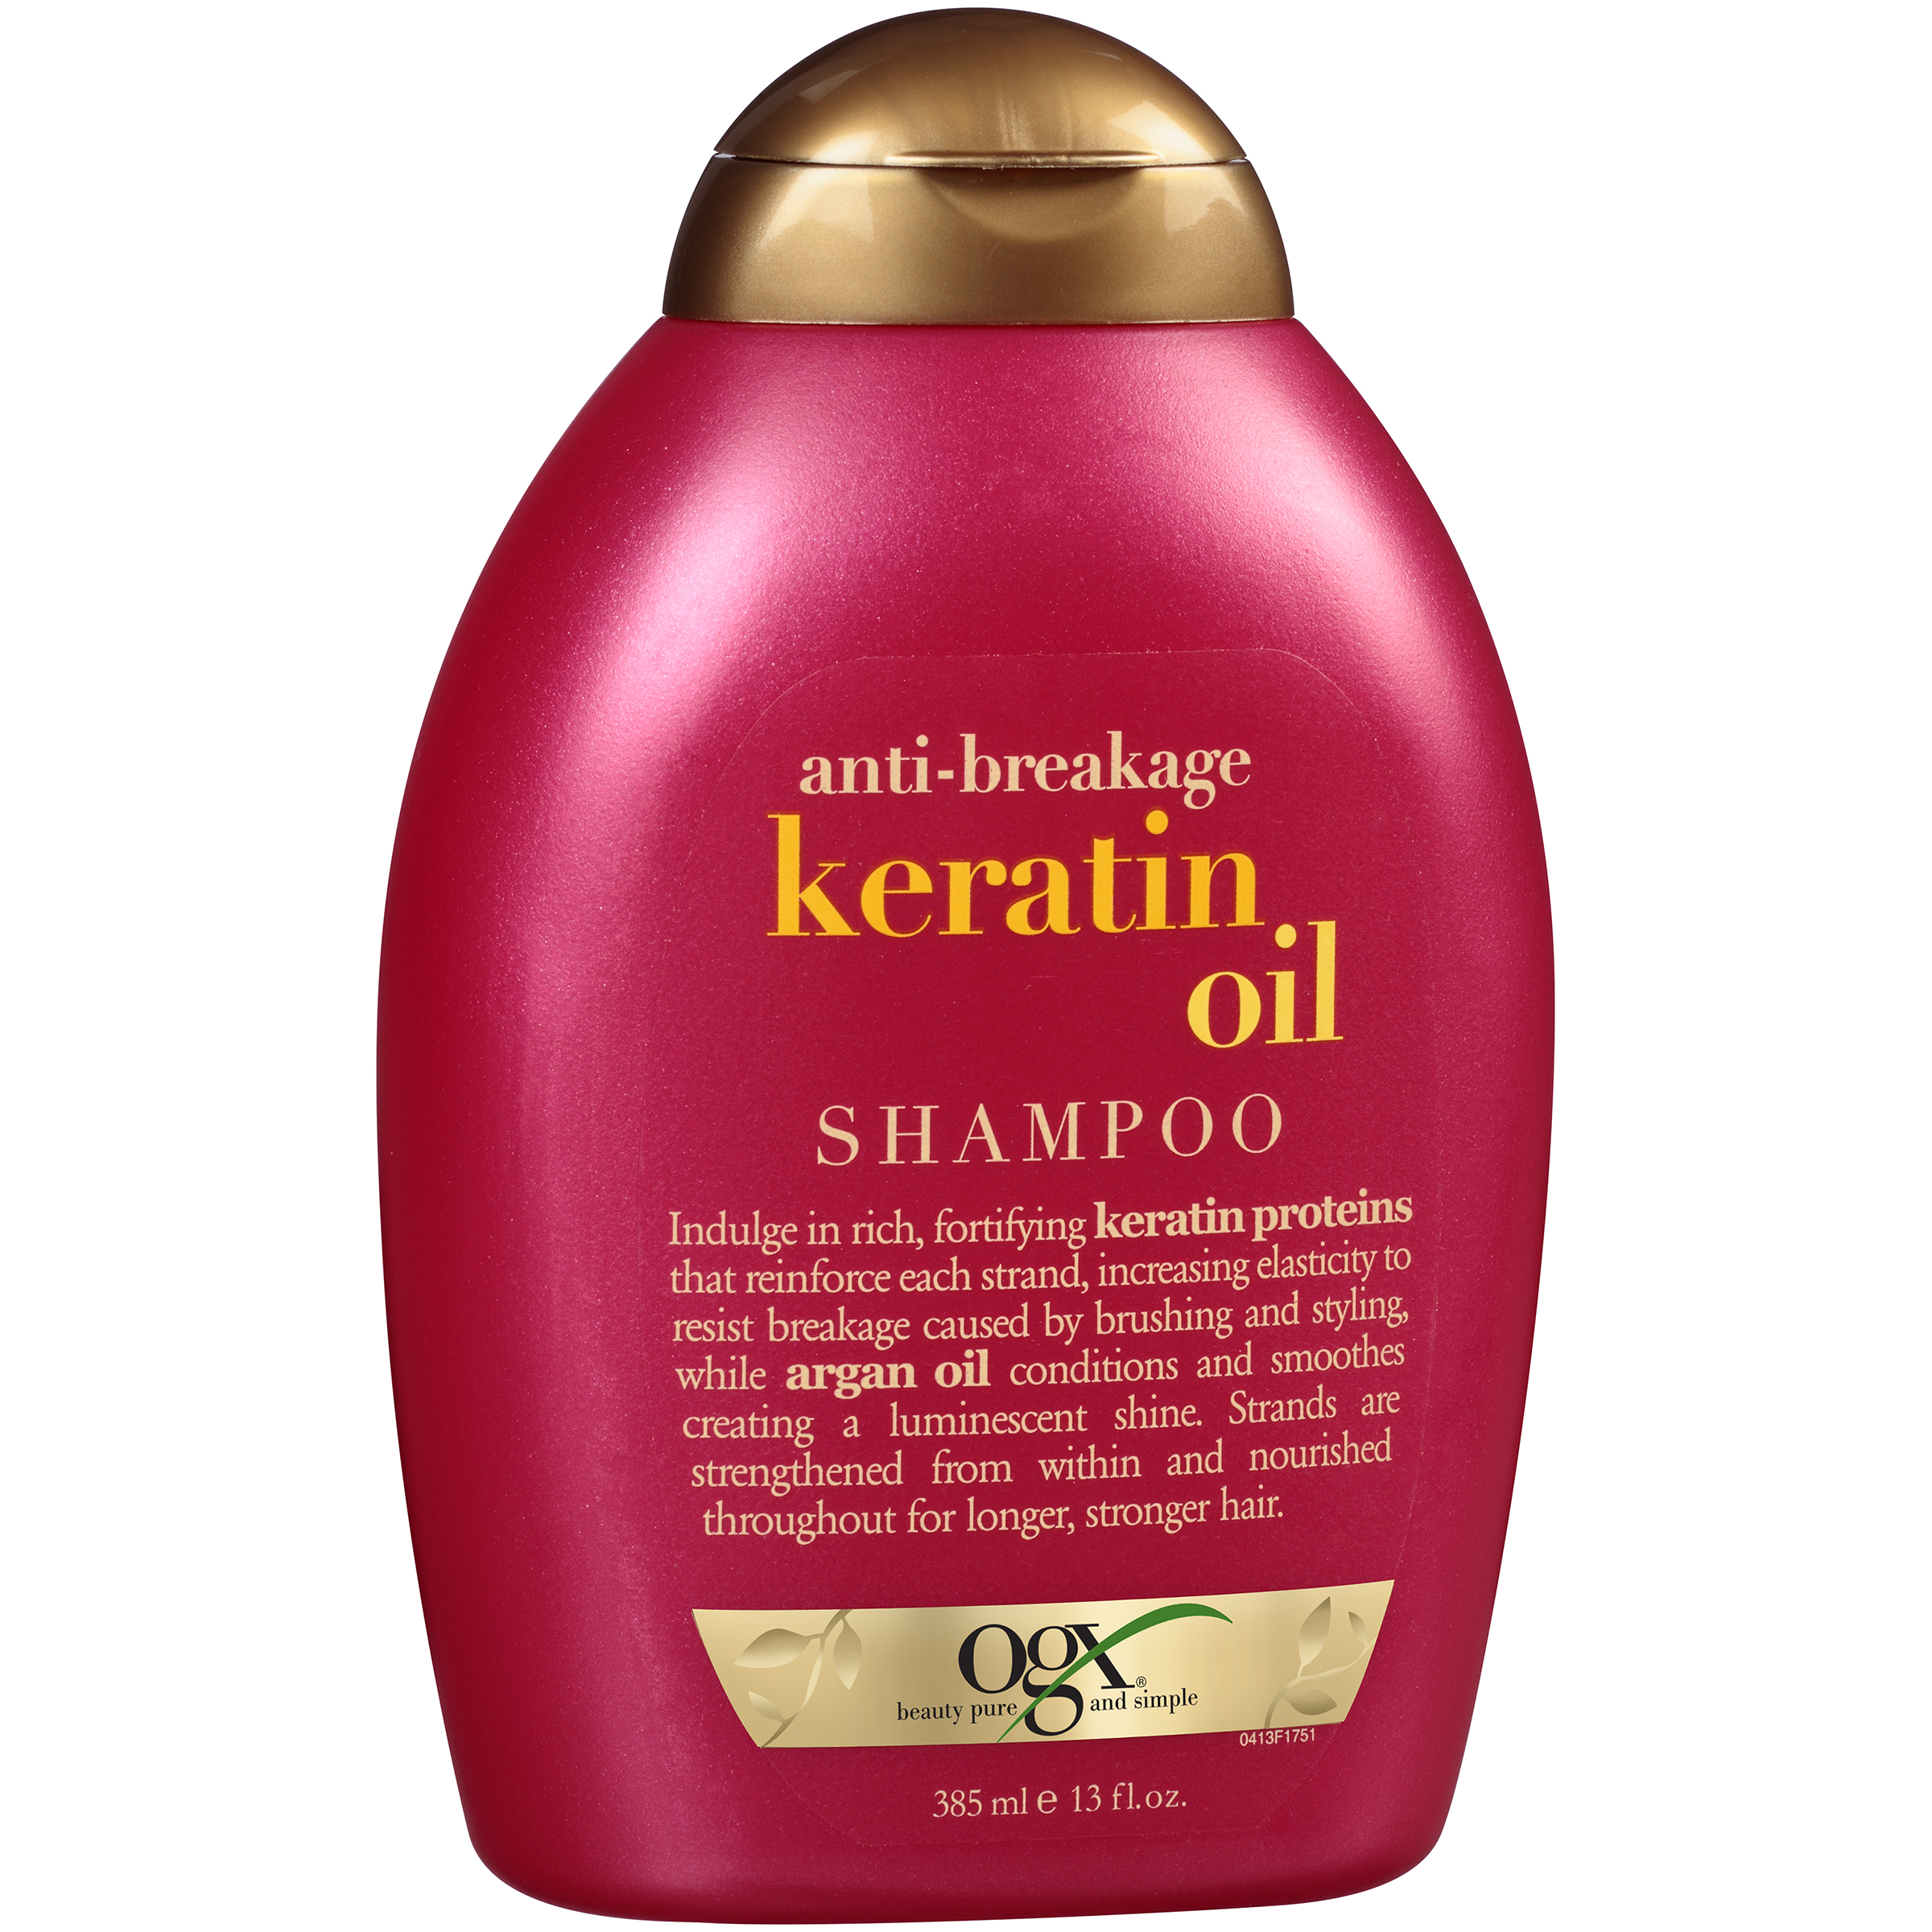 OGX�� Anti-Breakage Keratin Oil Shampoo 13 fl. oz. Squeeze Bottle